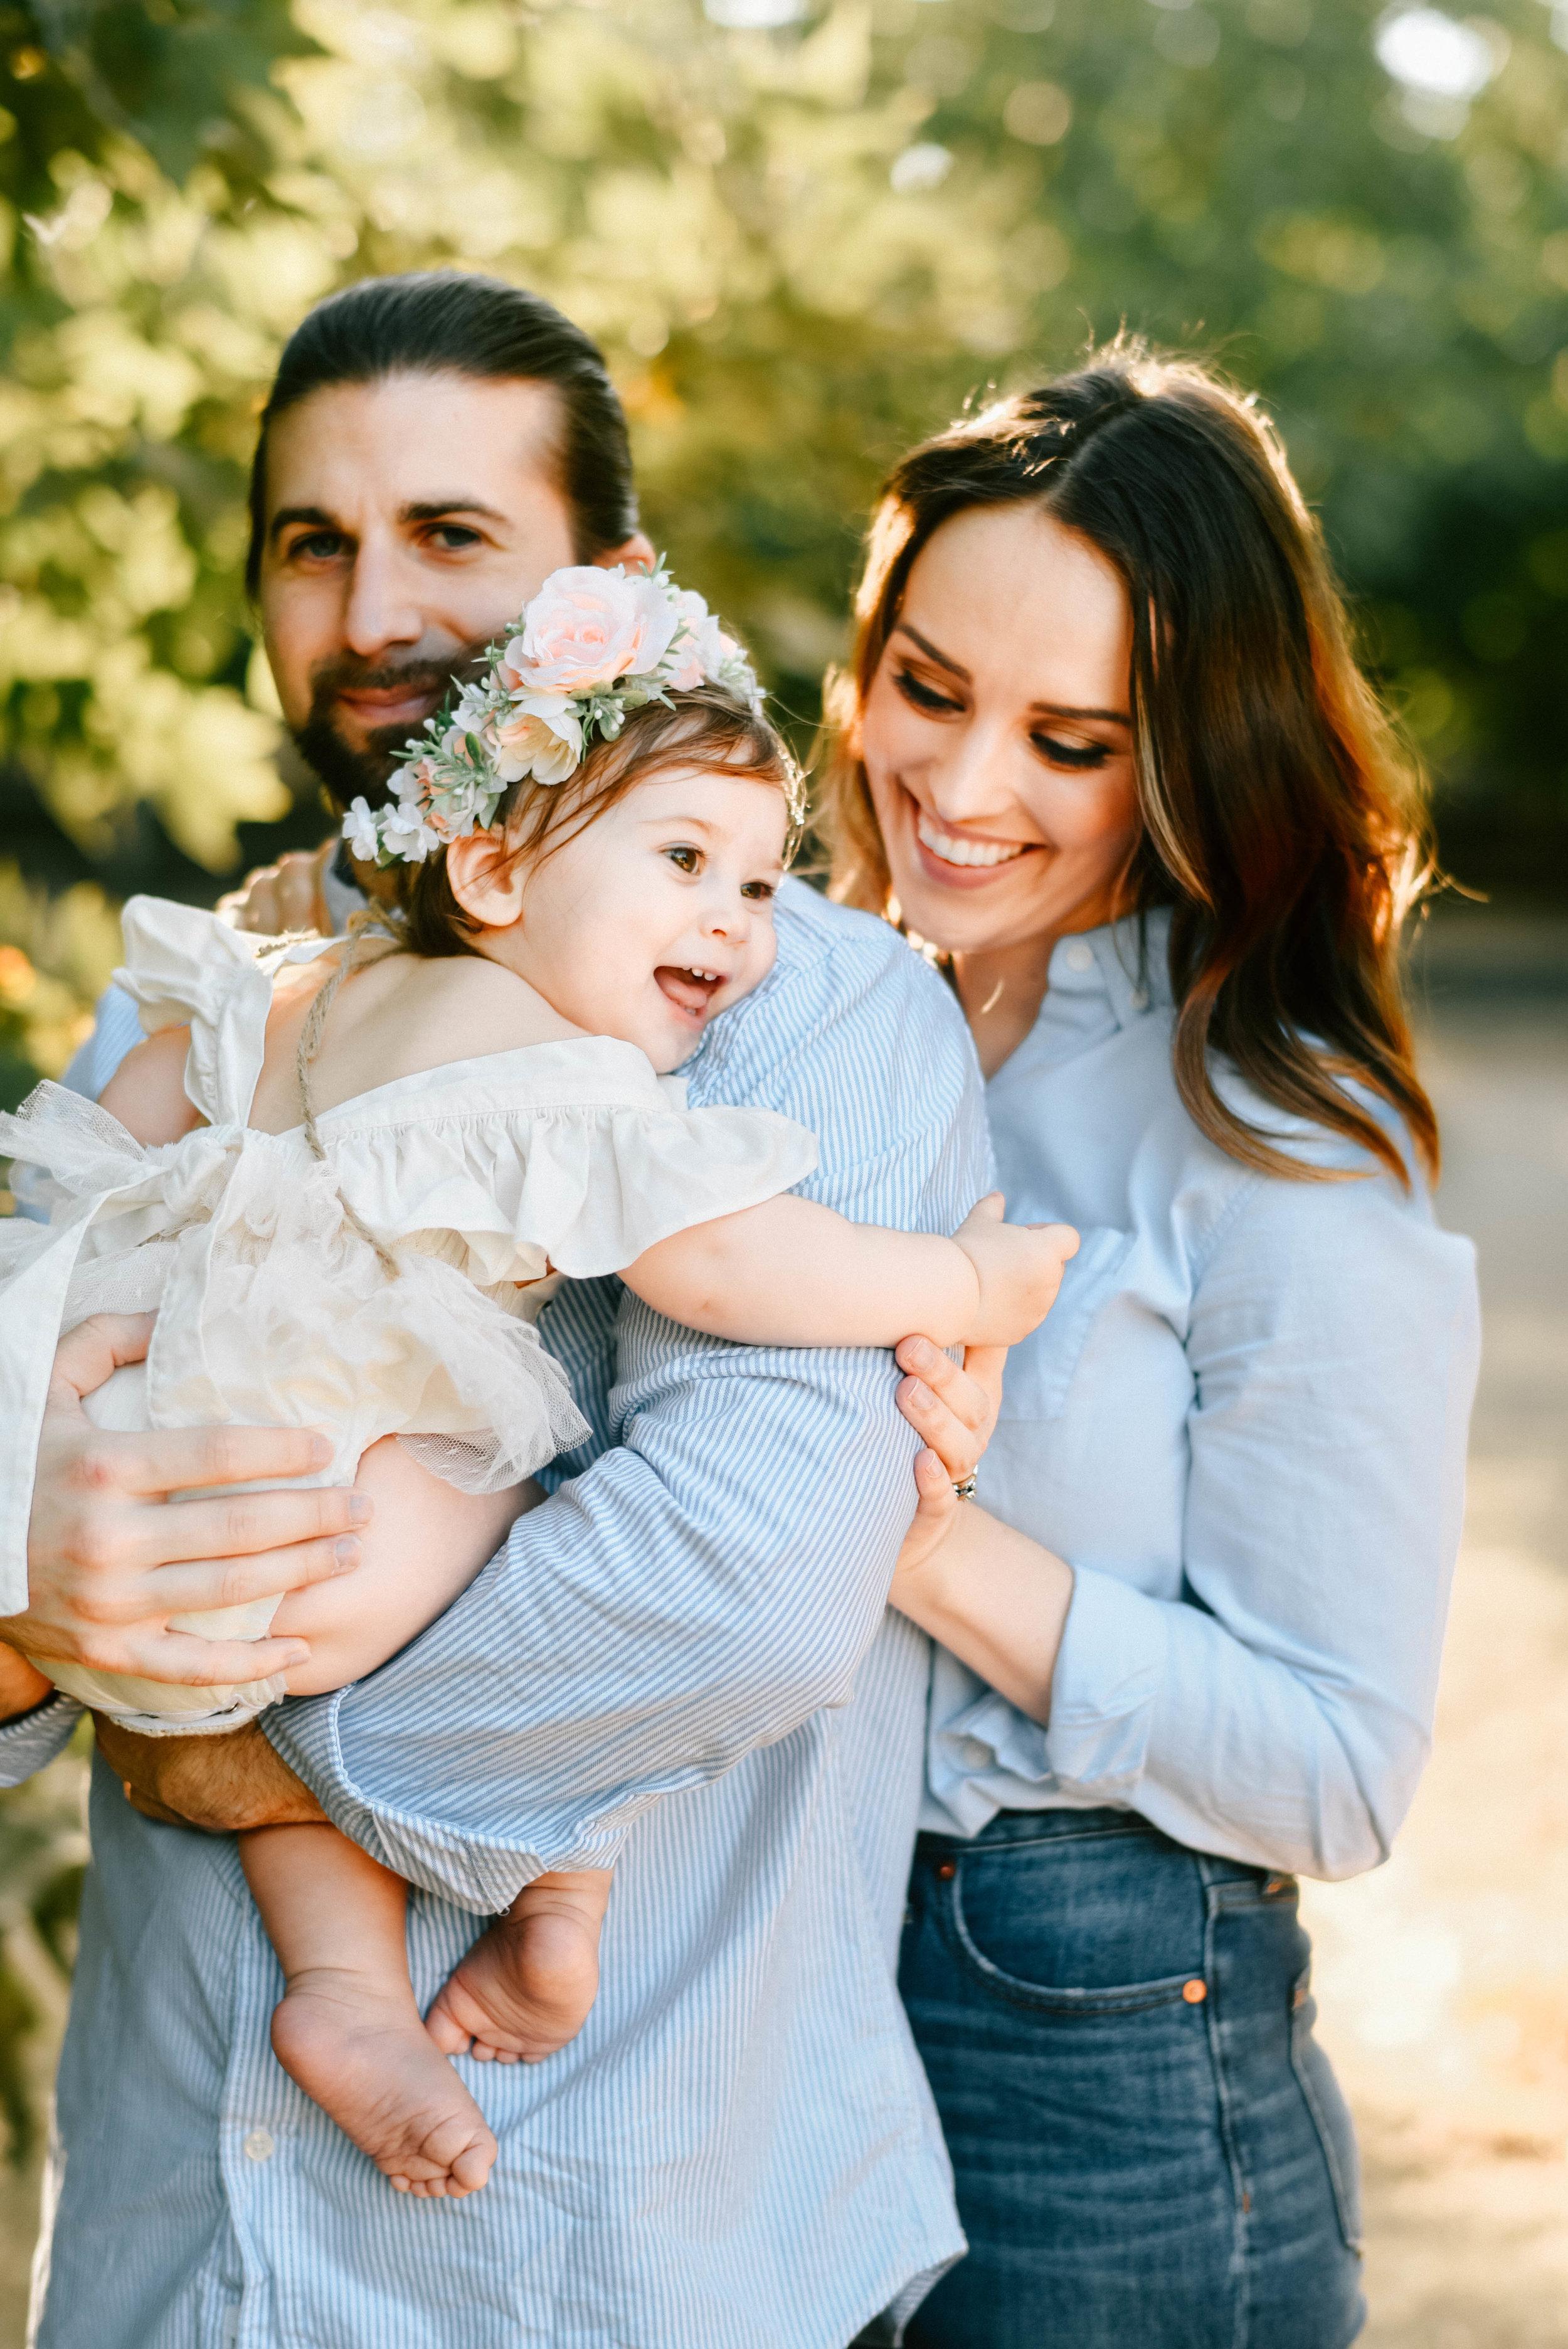 alyssajoyner+family-74.jpg